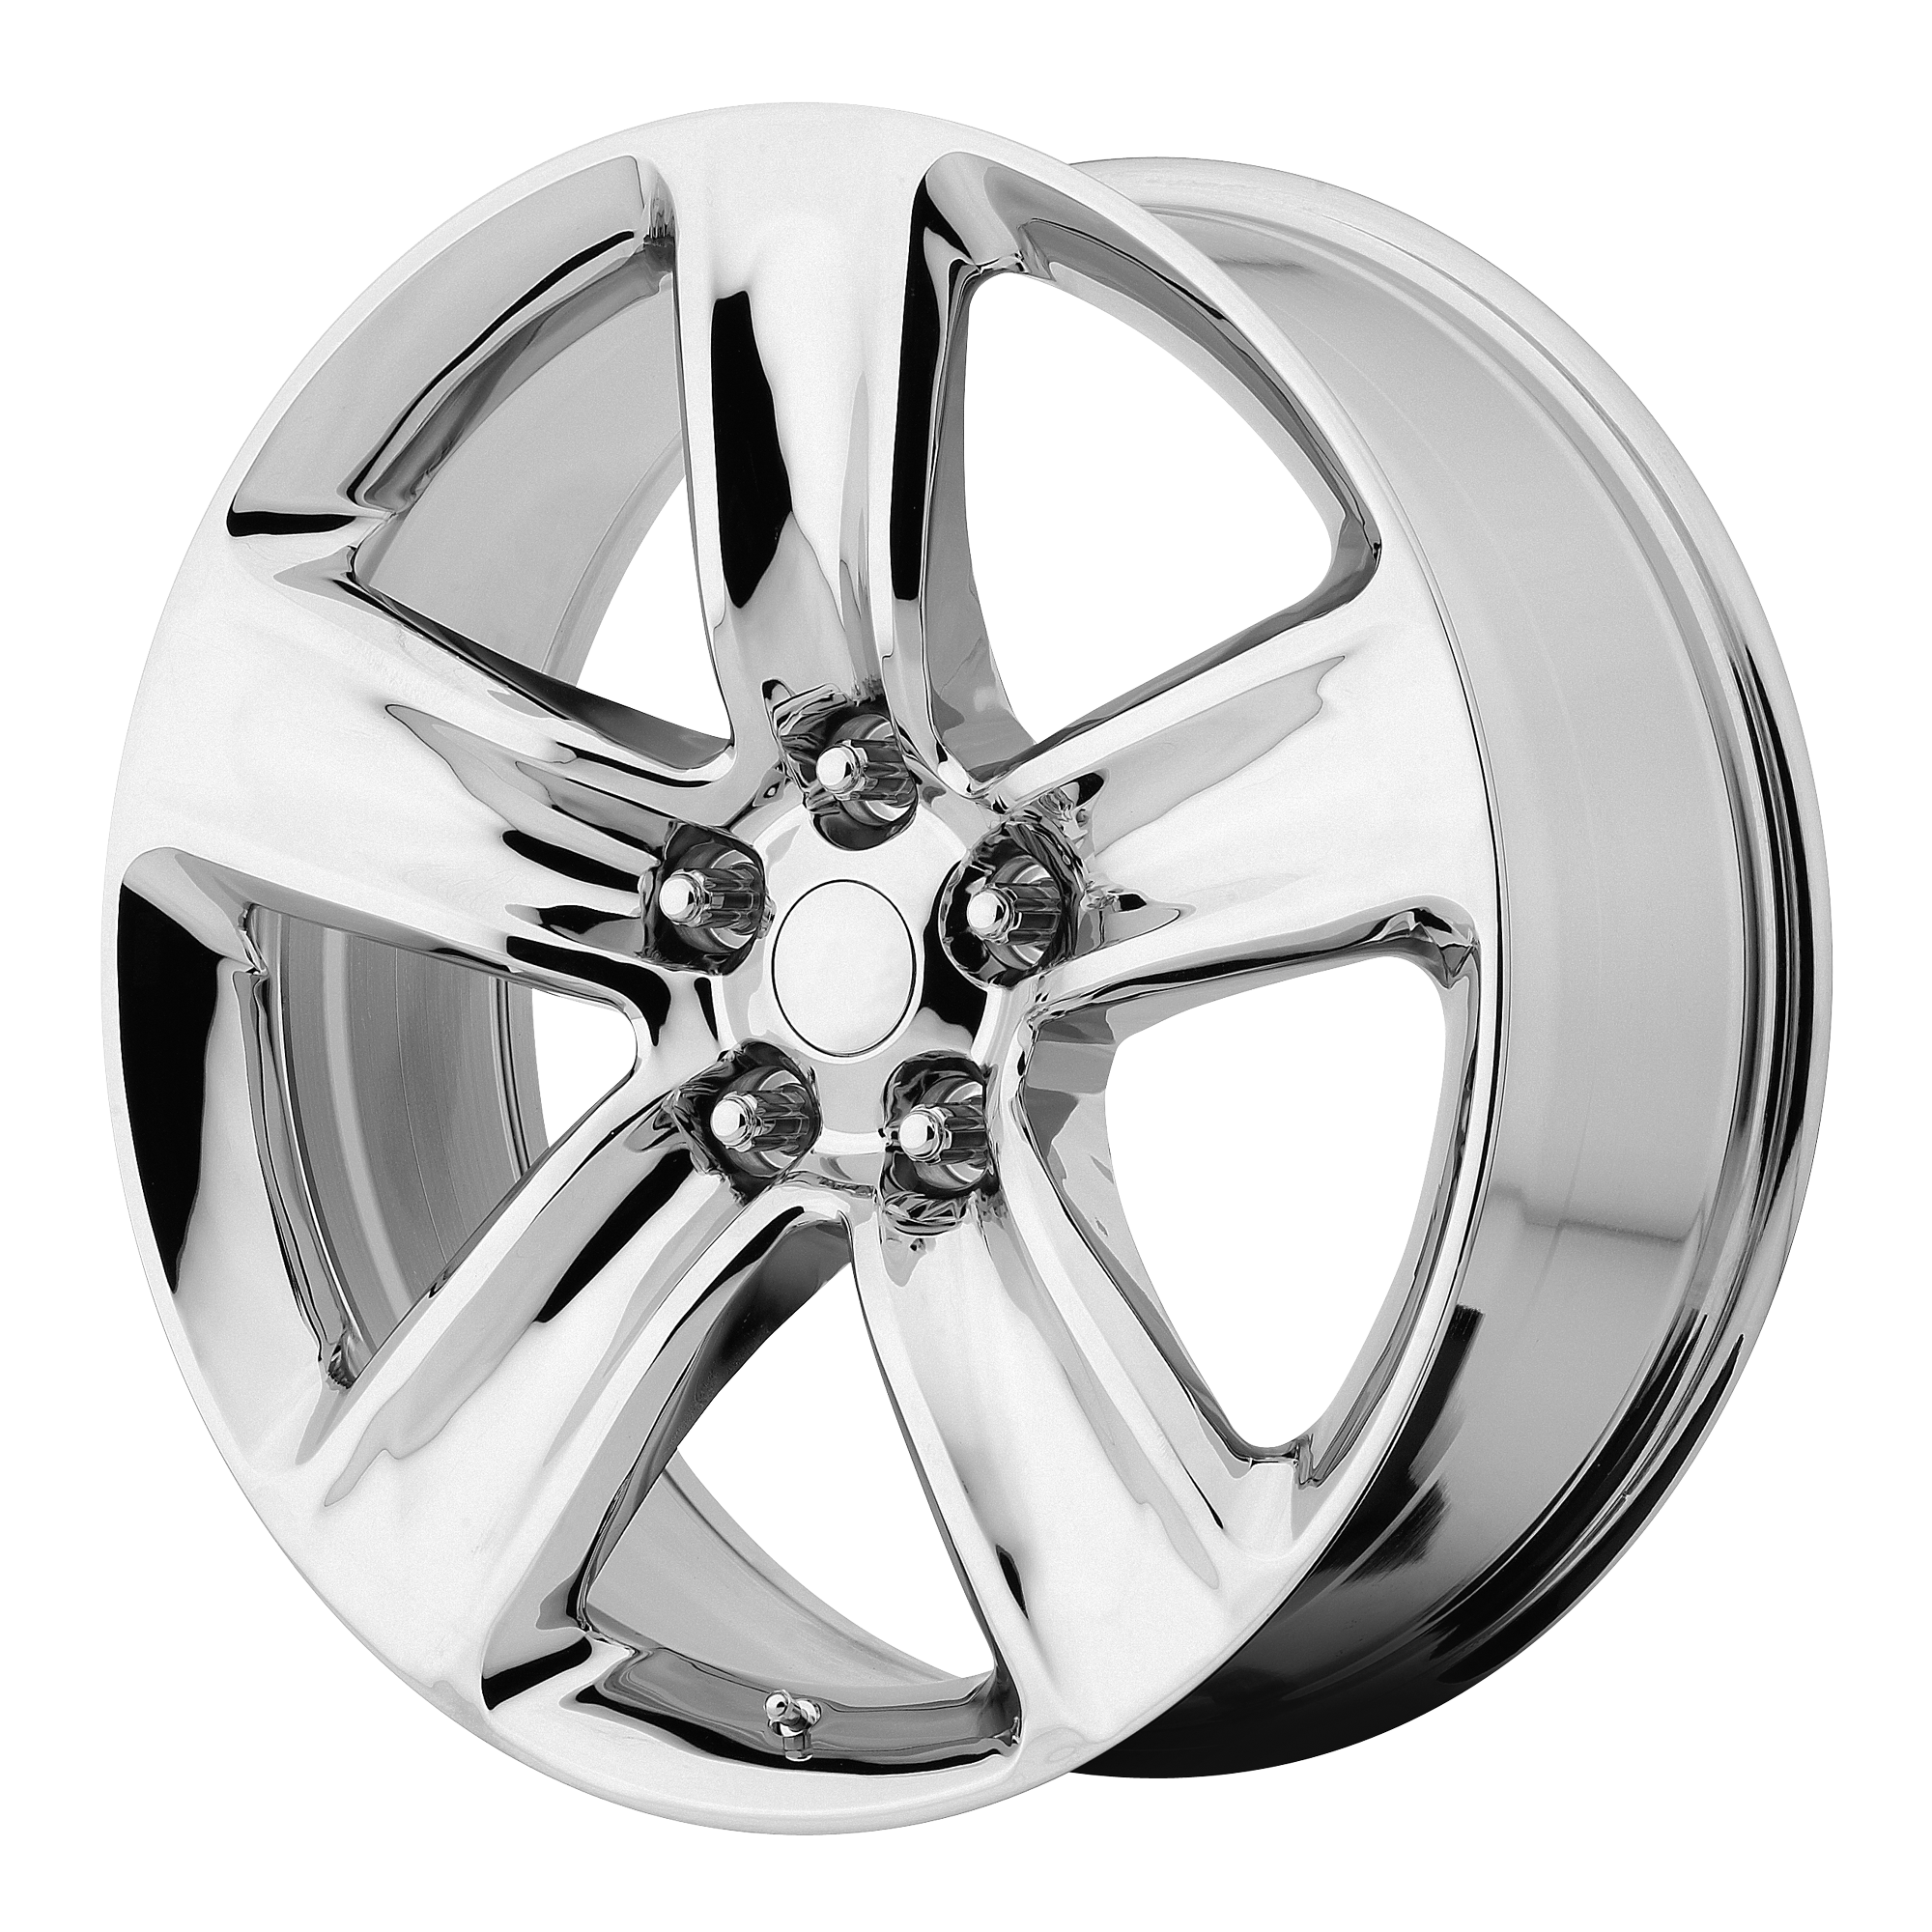 OE Creations Replica Wheels OE Creations PR154 Chrome